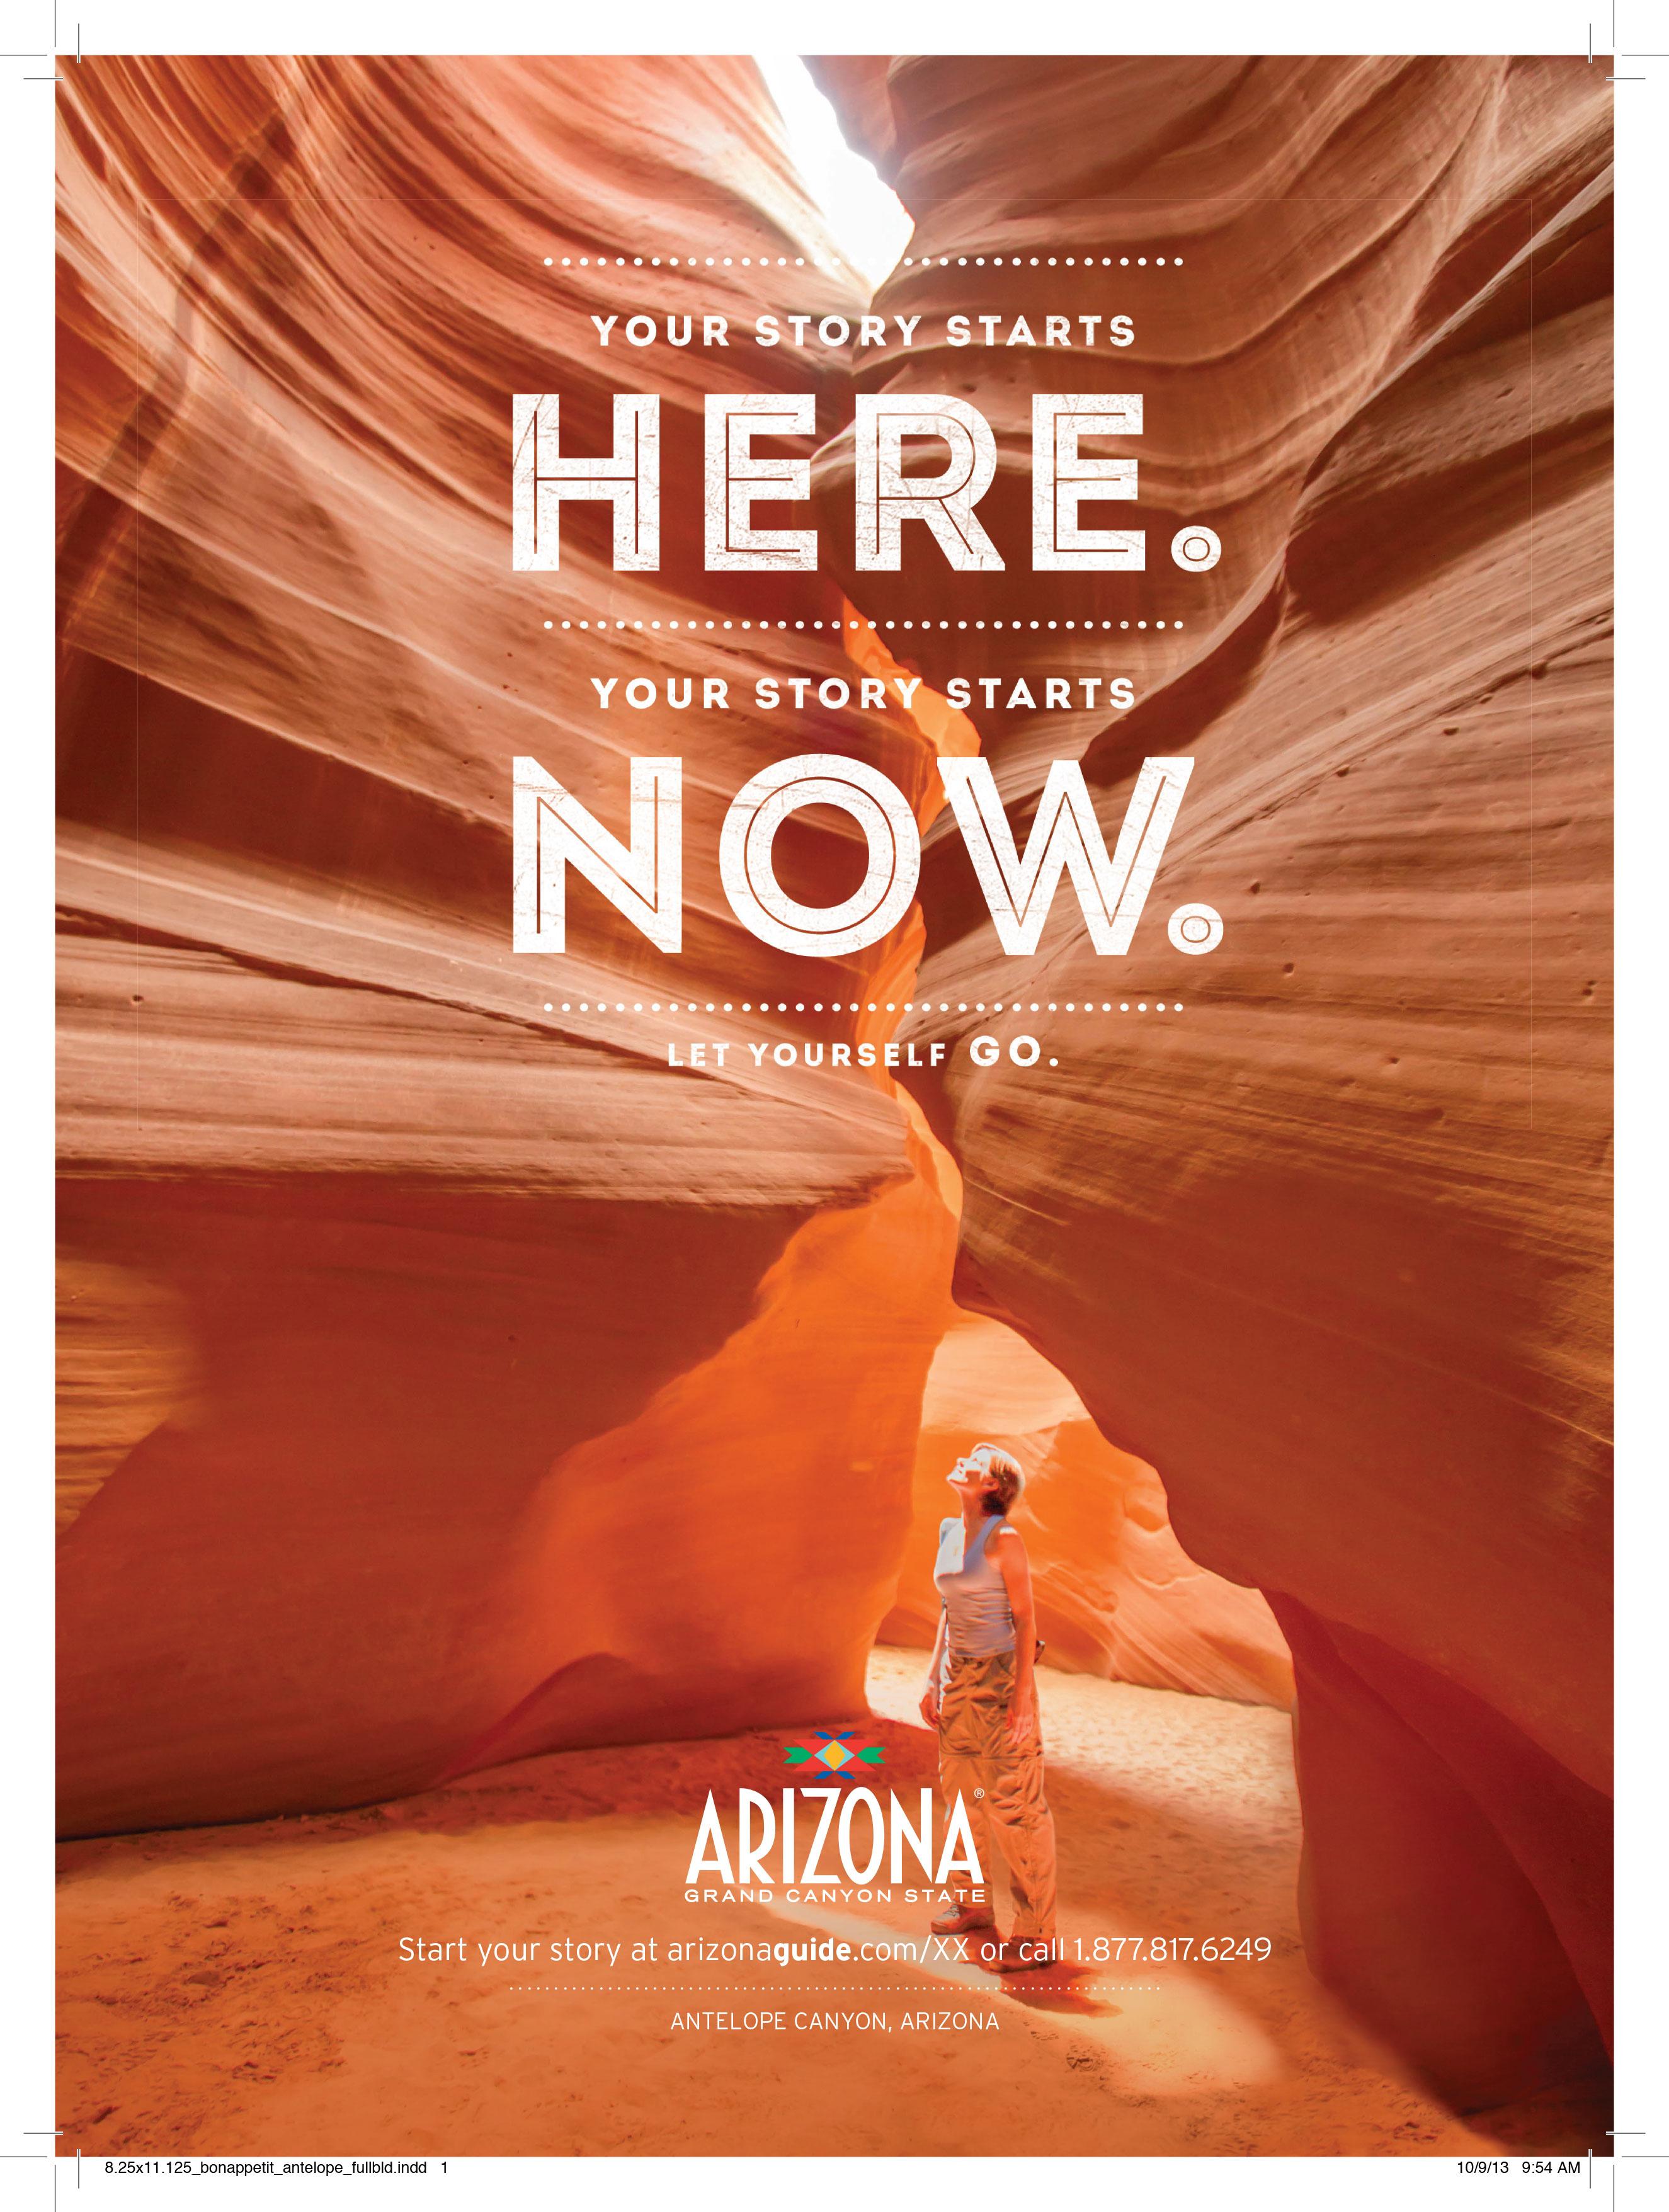 Arizona Office of Tourism Debuts New Travel Advertising ...